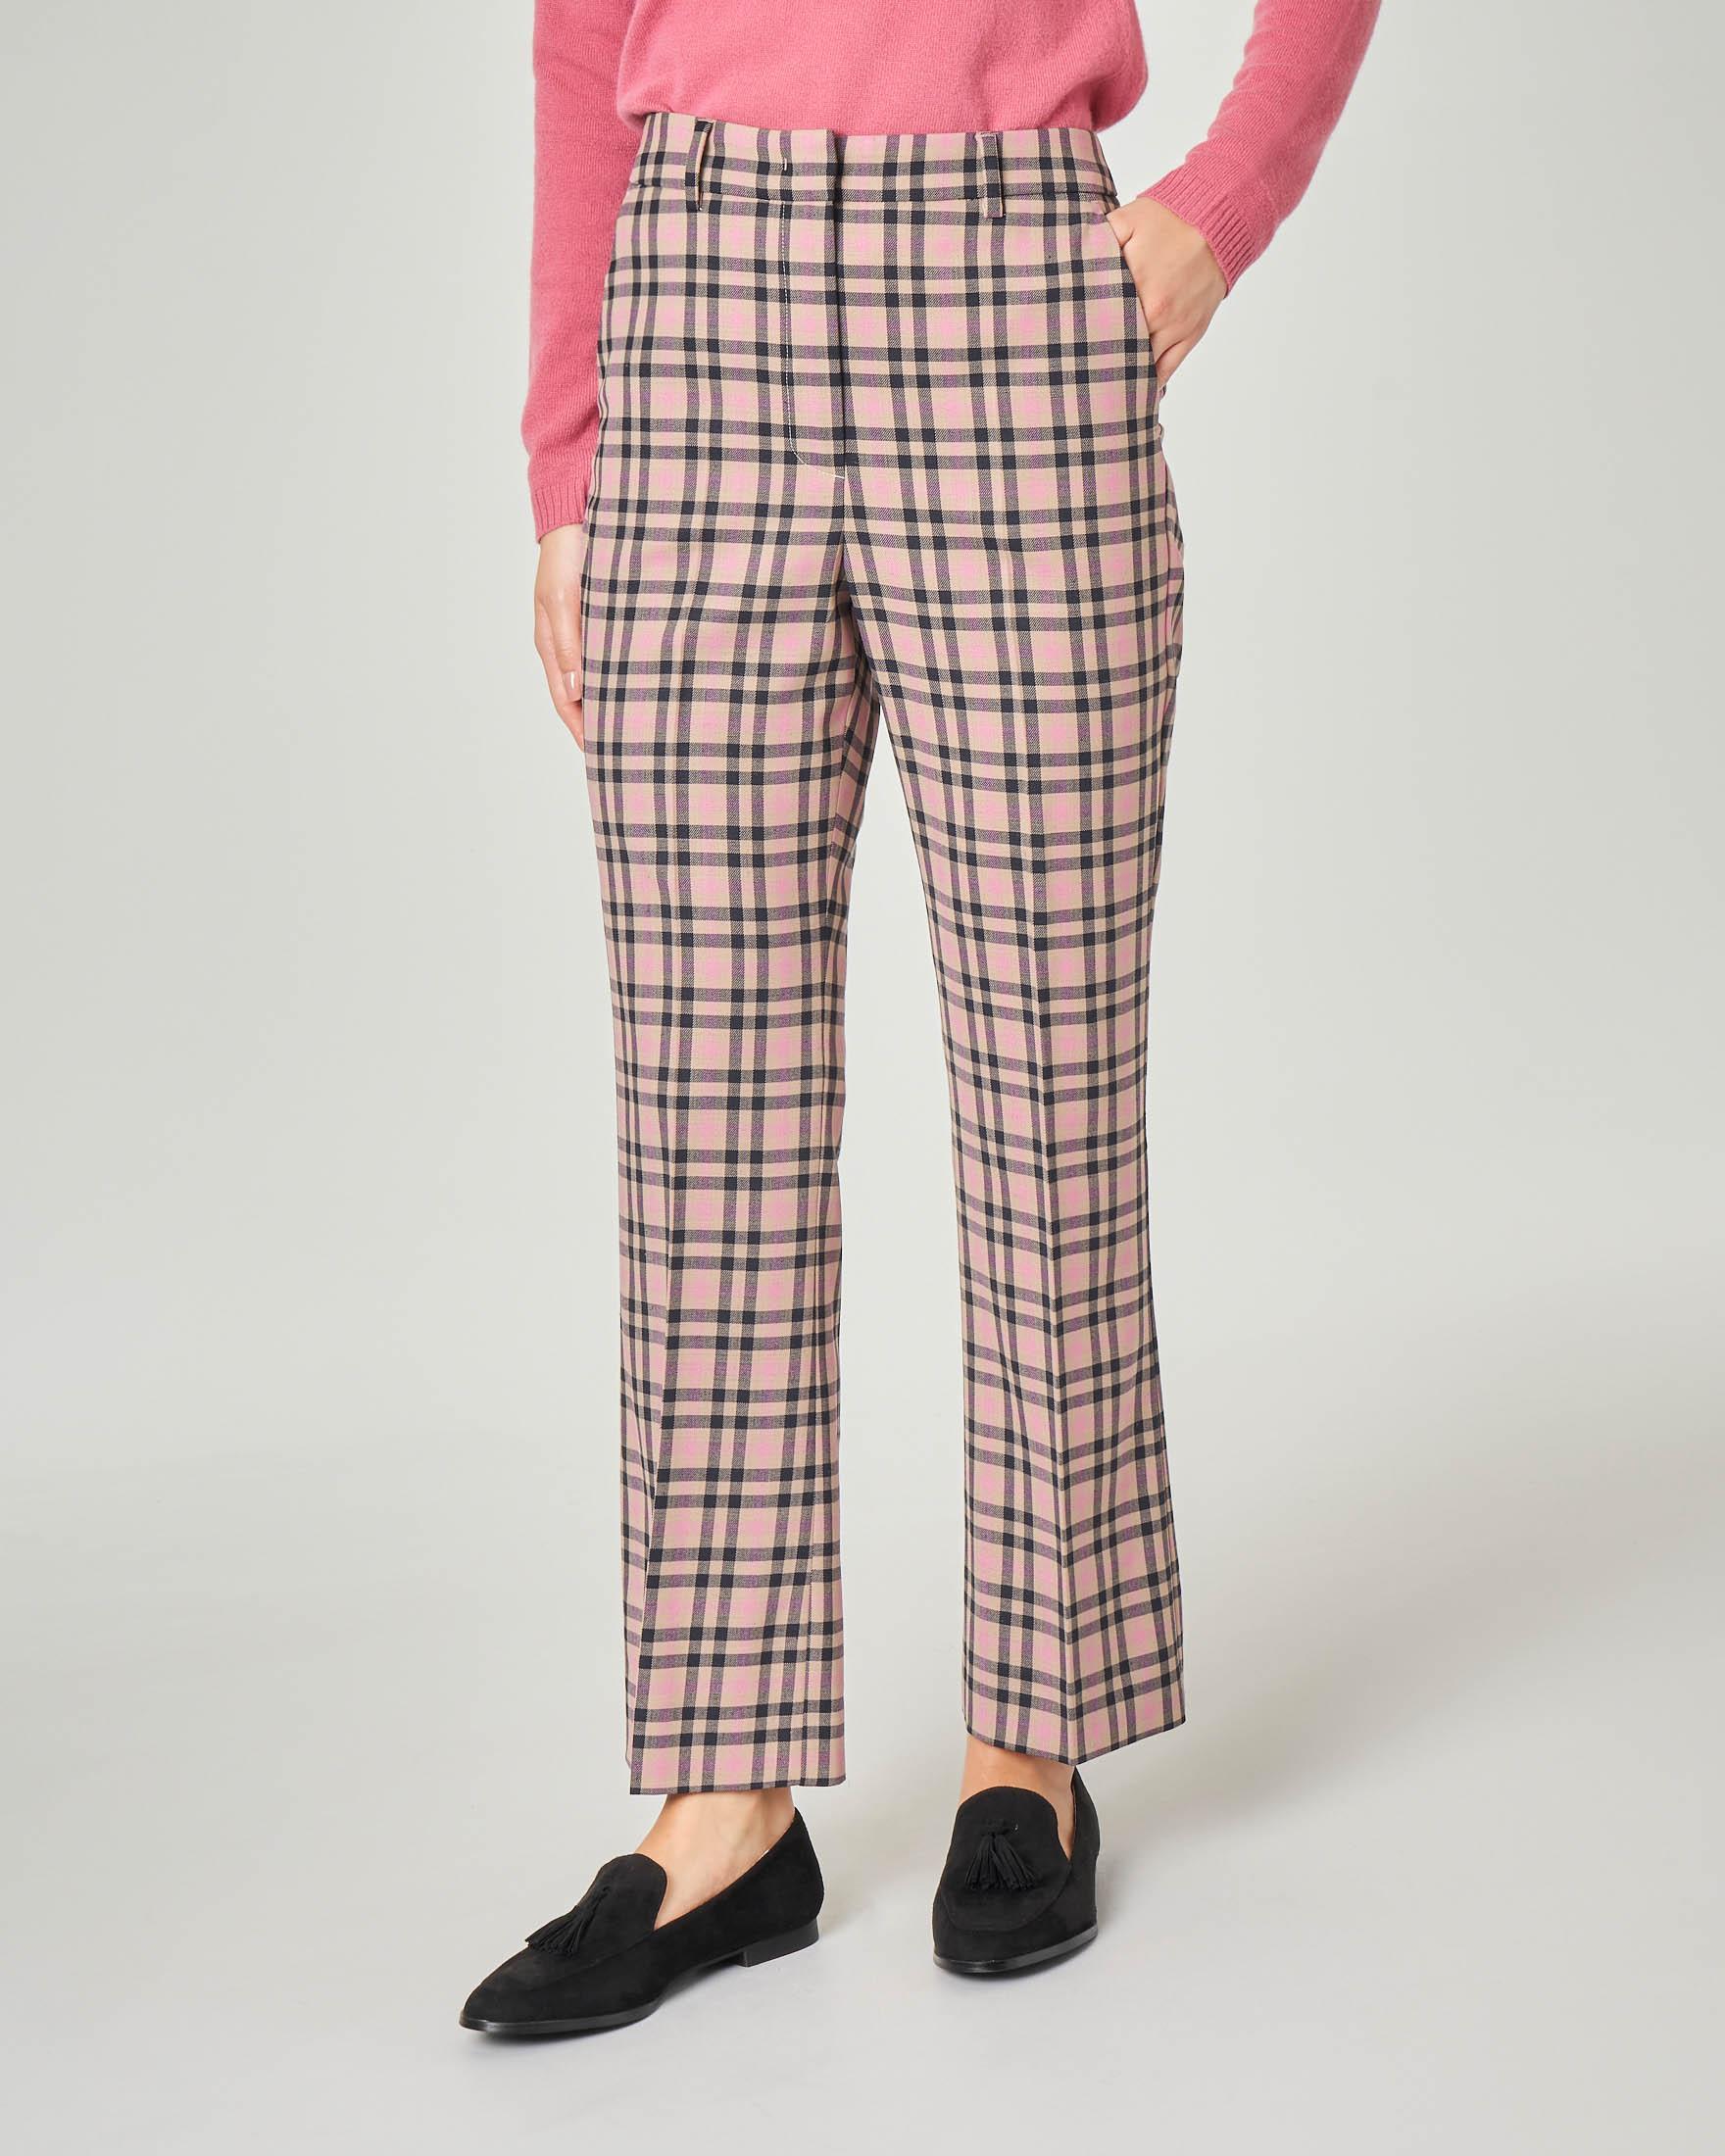 Pantaloni in gabardina di mista lana rosa fantasia check